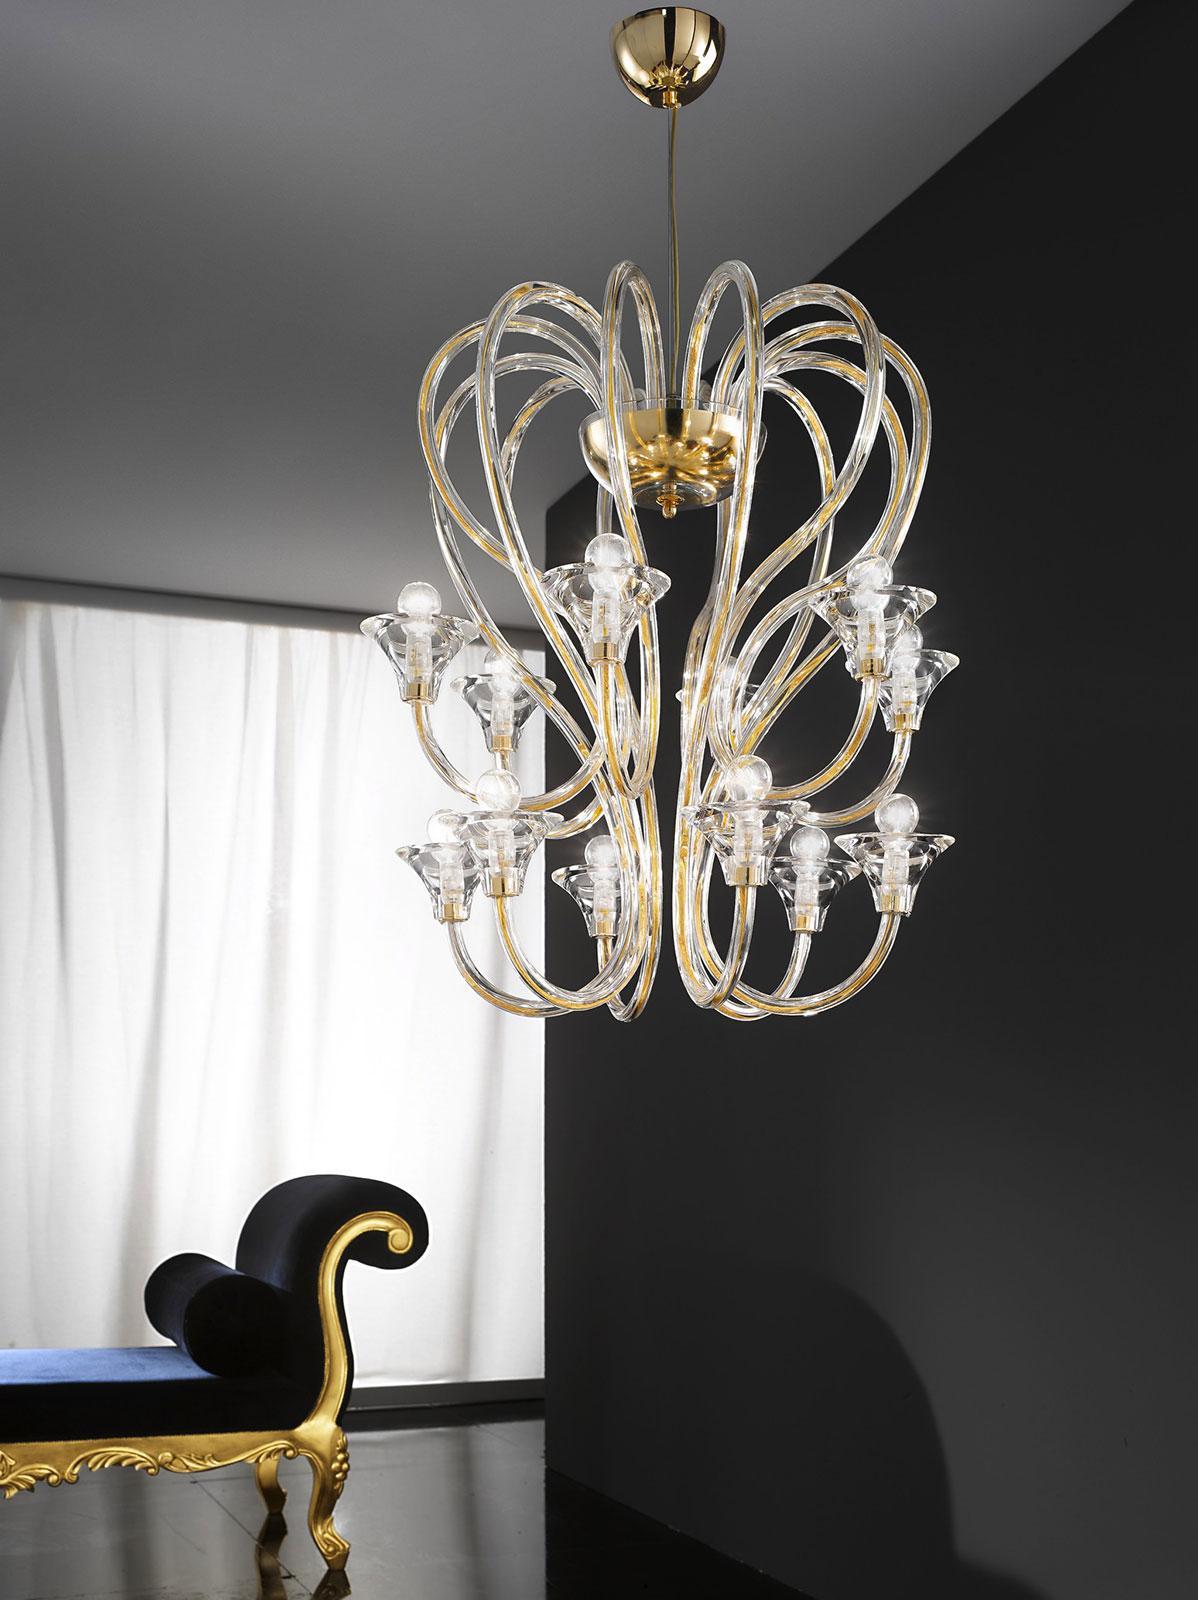 Luminaire Et Suspension En Verre Vente En Ligne Italy Dream Design